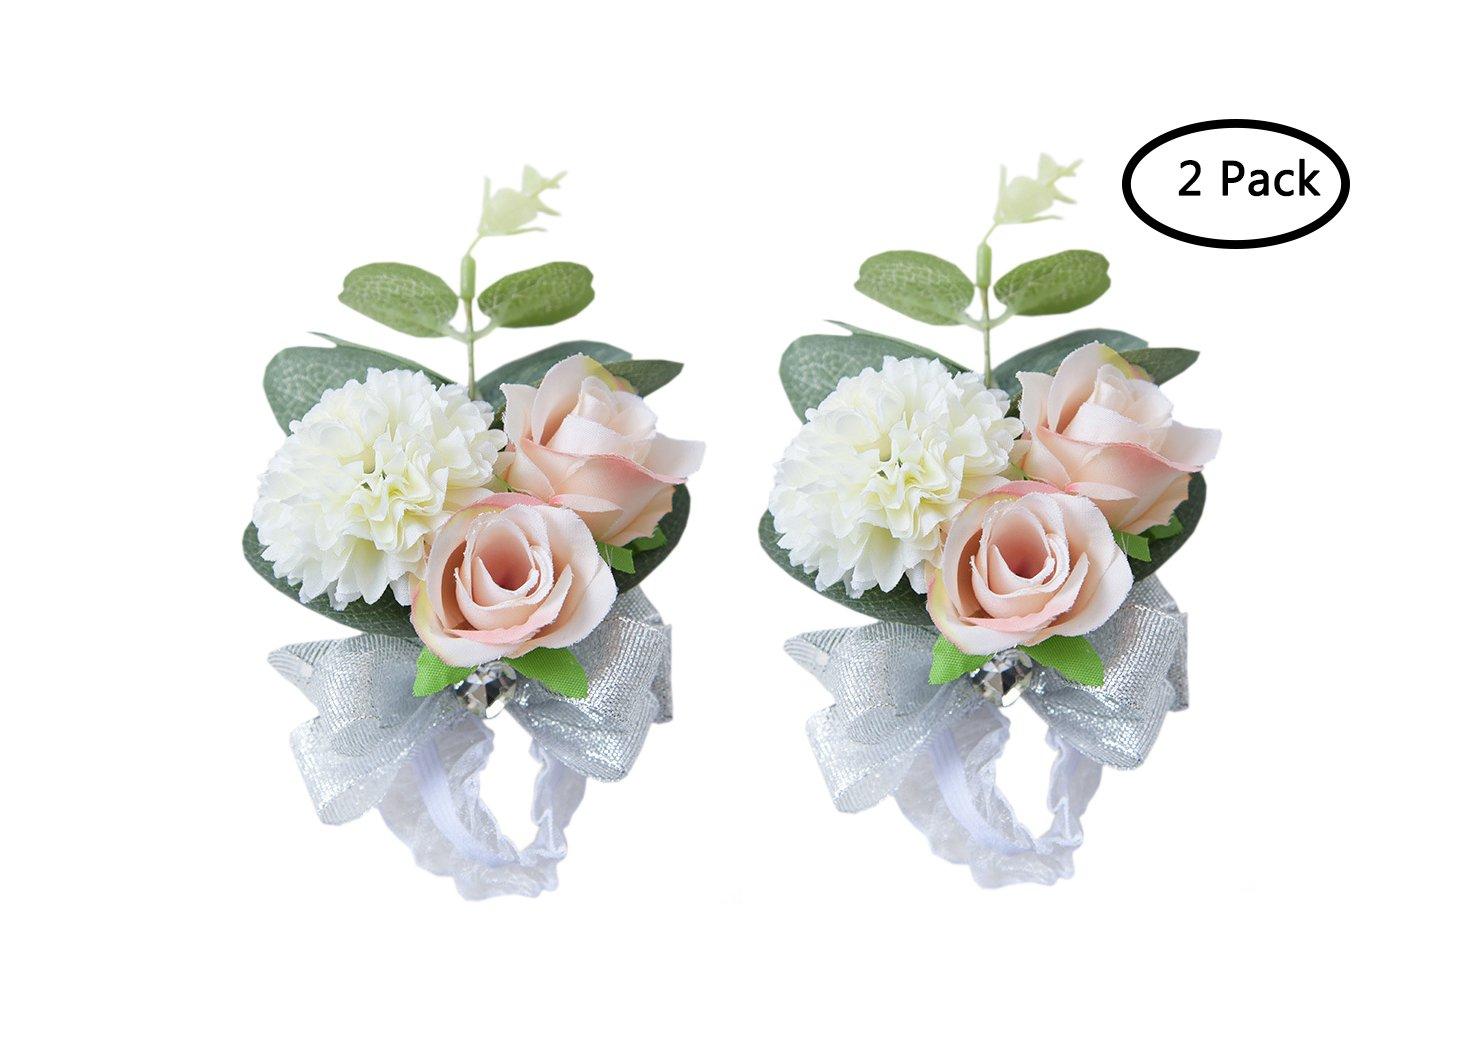 MOJUN-Wedding-Bridal-Bridesmaid-Wrist-Flower-Corsage-Wedding-Planner-Wrist-Corsage-Hand-Flower-Pack-of-2